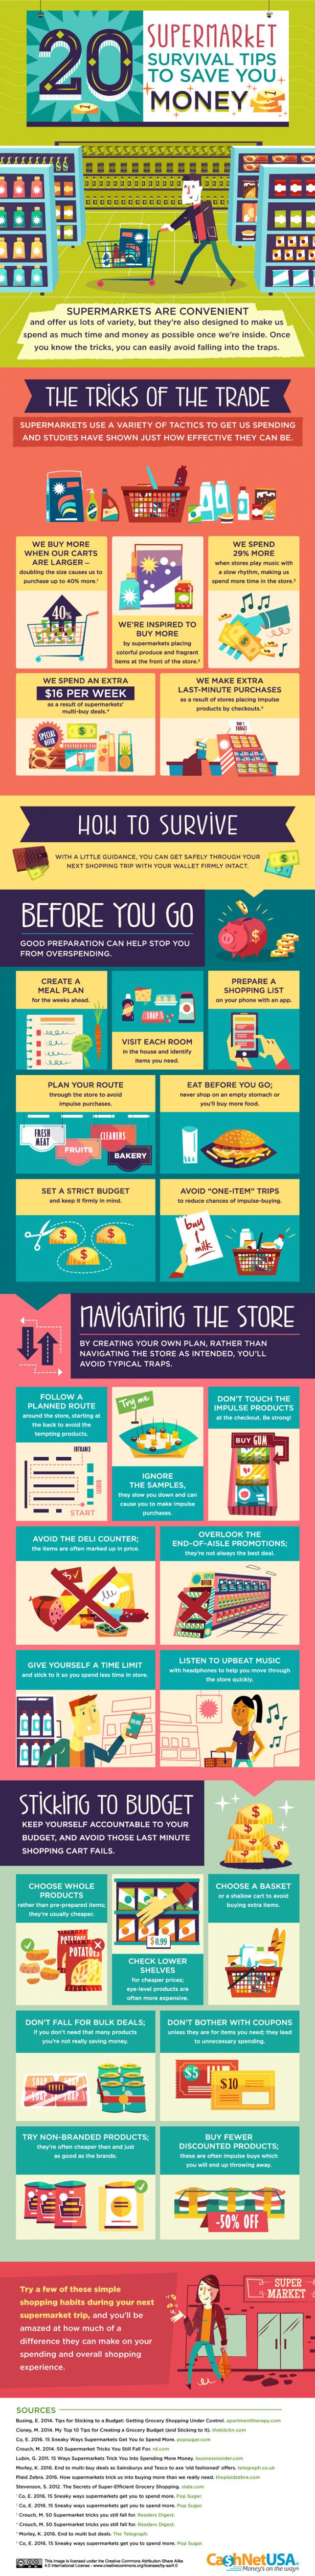 20-Supermarket-Tips